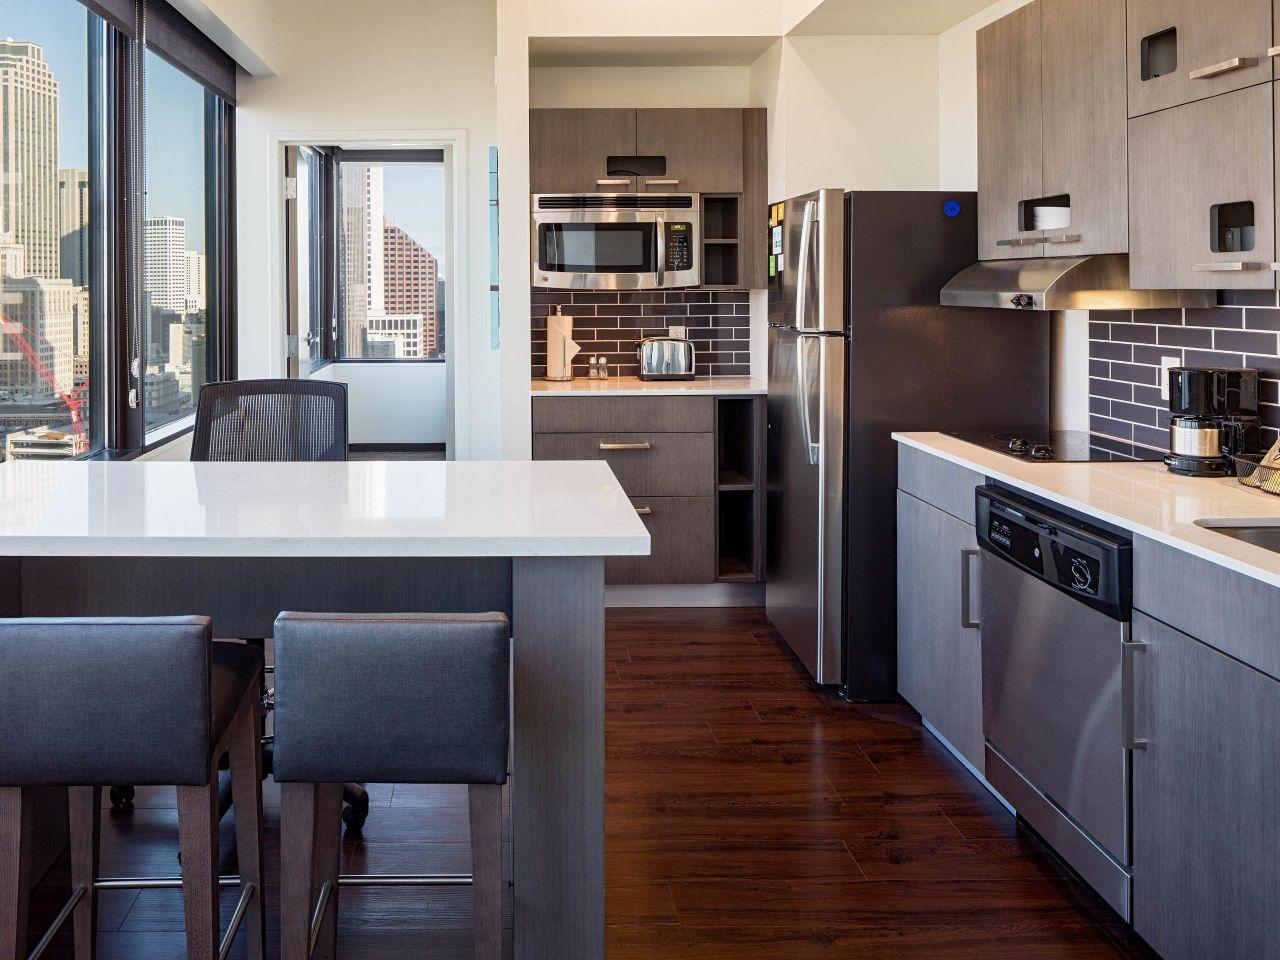 Hyatt House kitchen